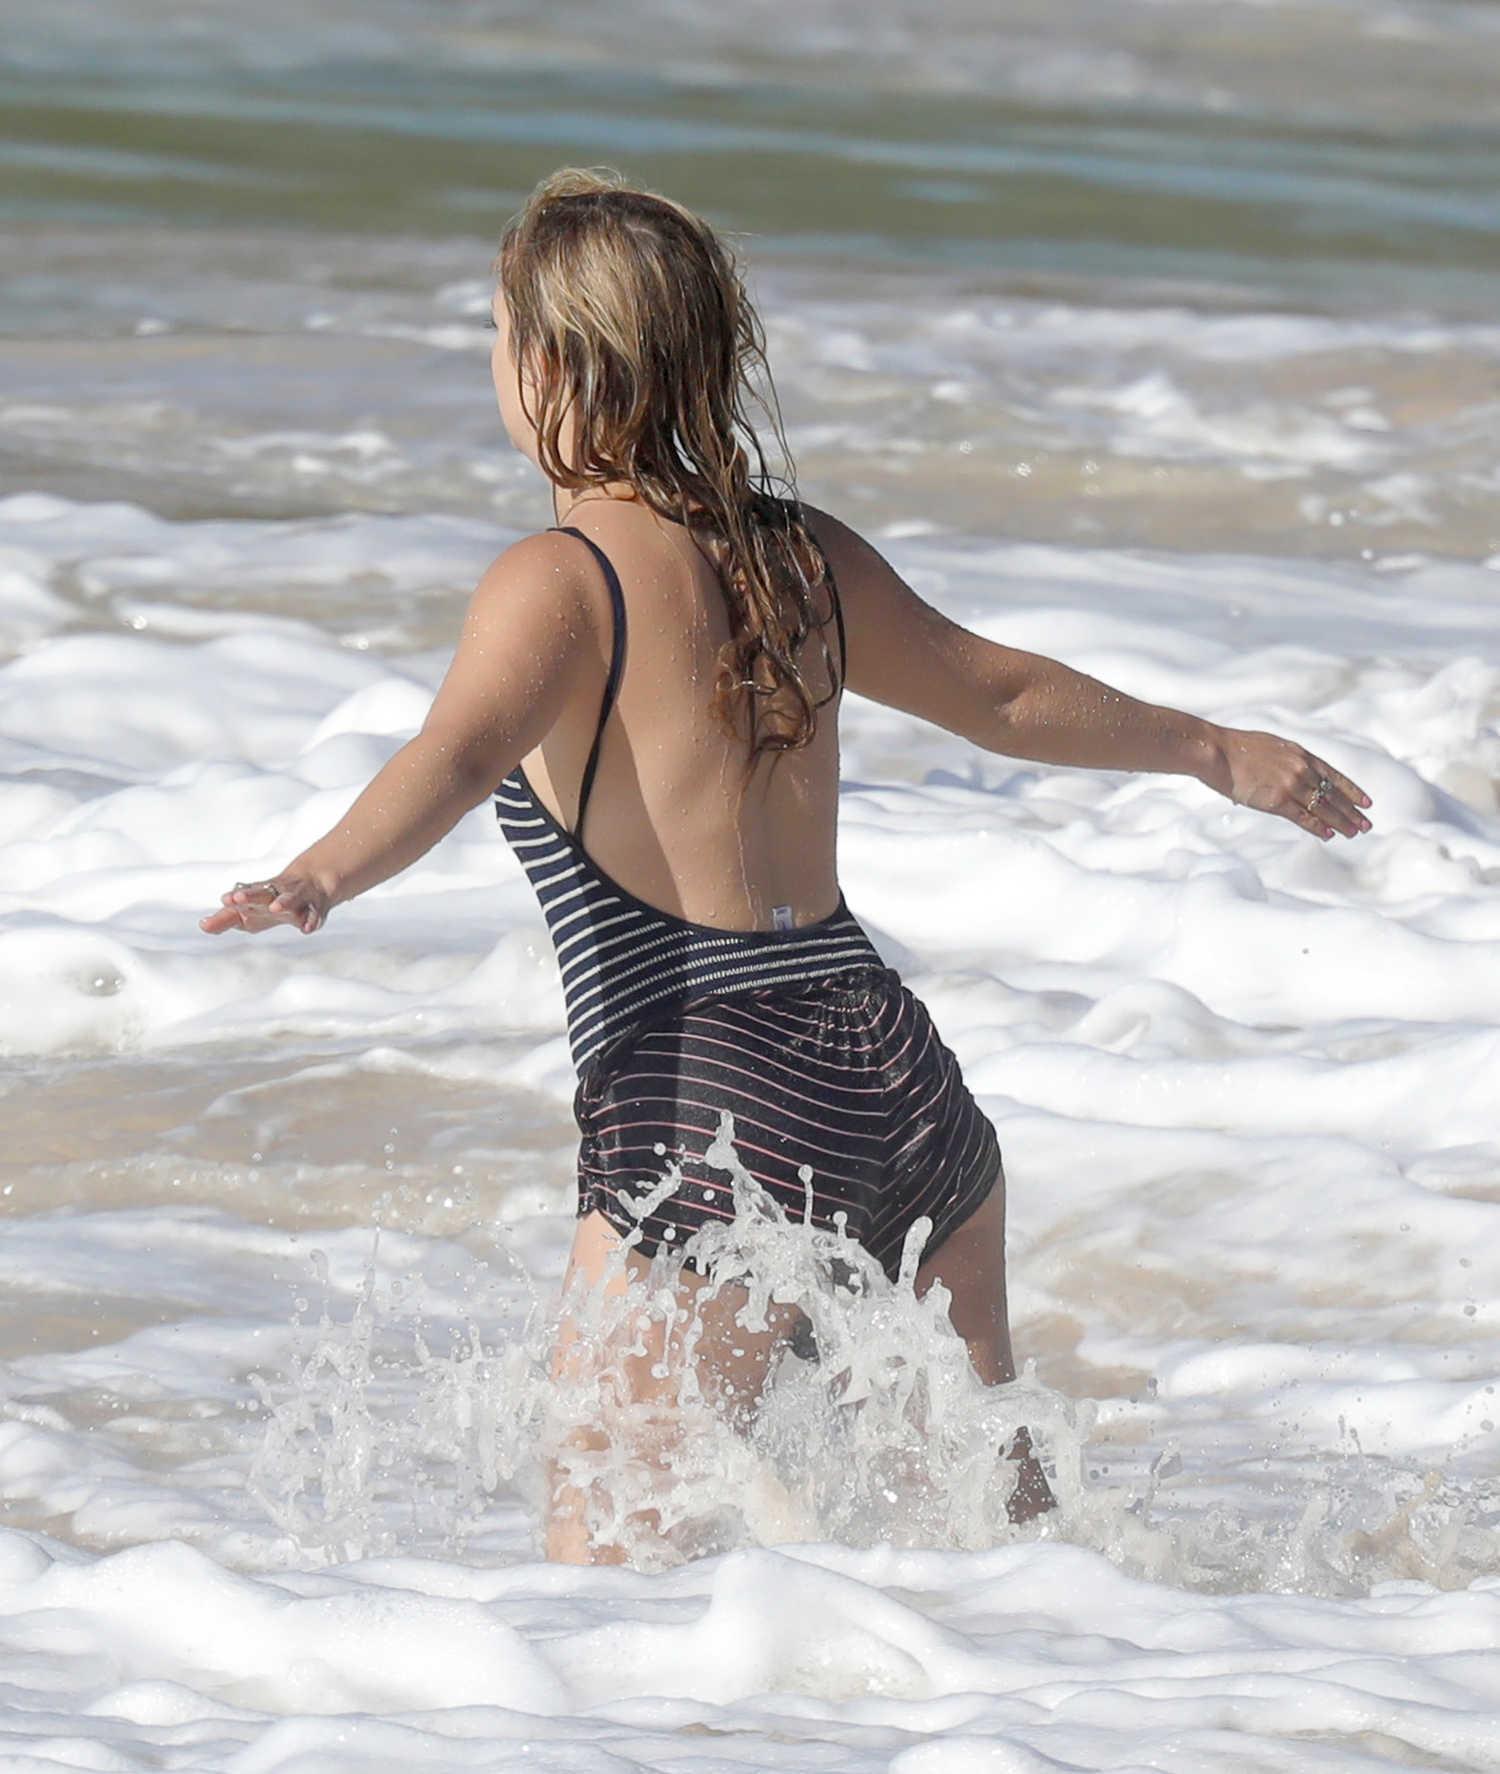 Billie Lourd at the Beach in St. Barts – Celeb Donut